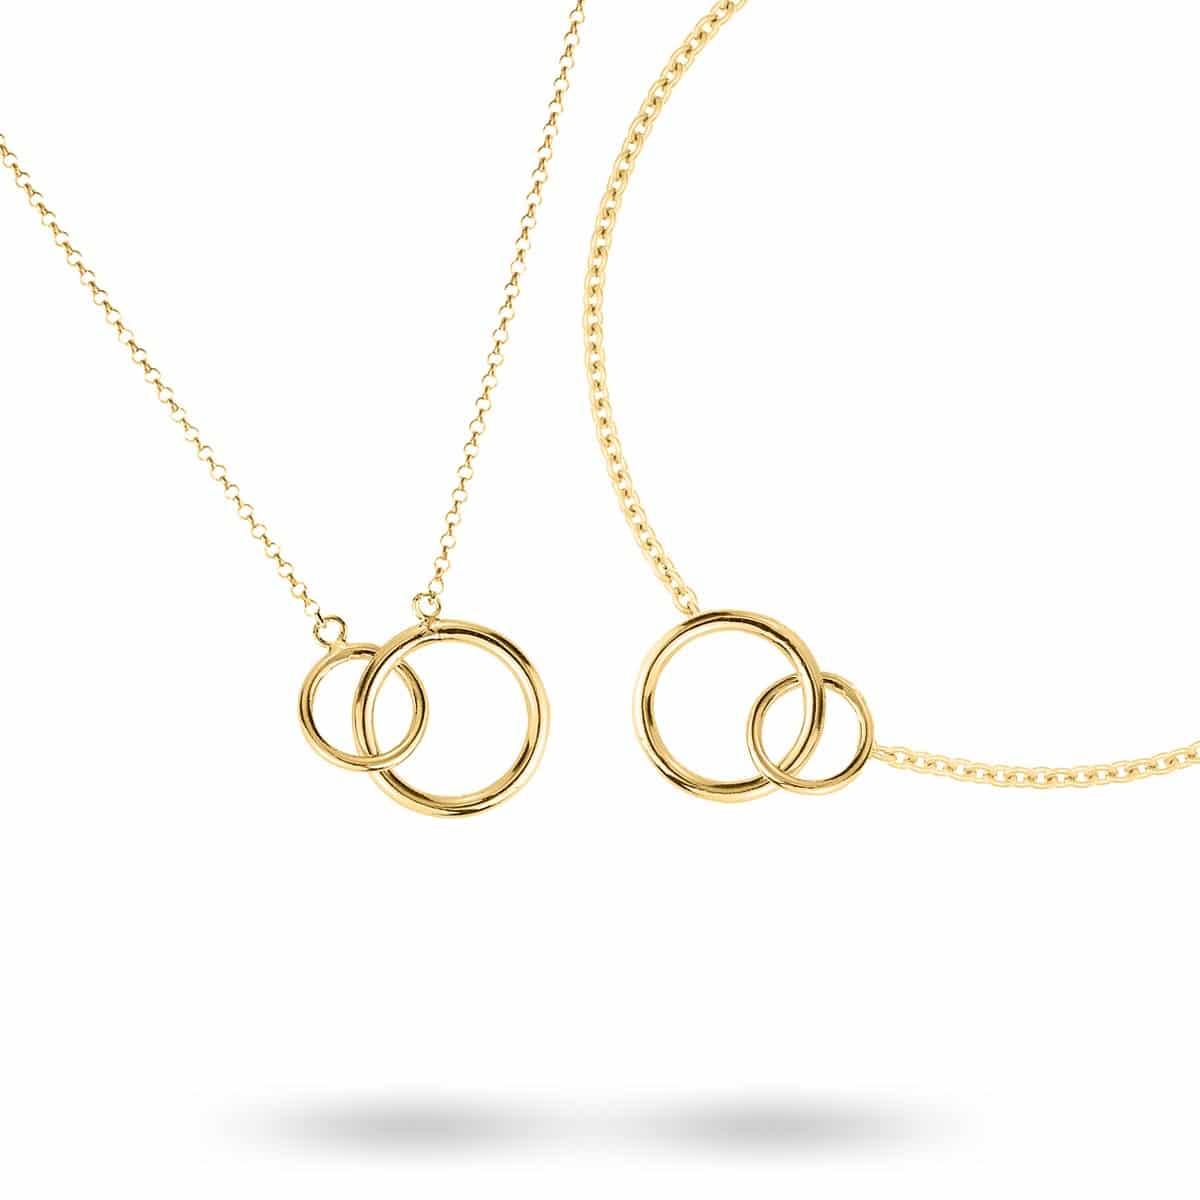 sophiebysophie-mini-circle-set-guld-1